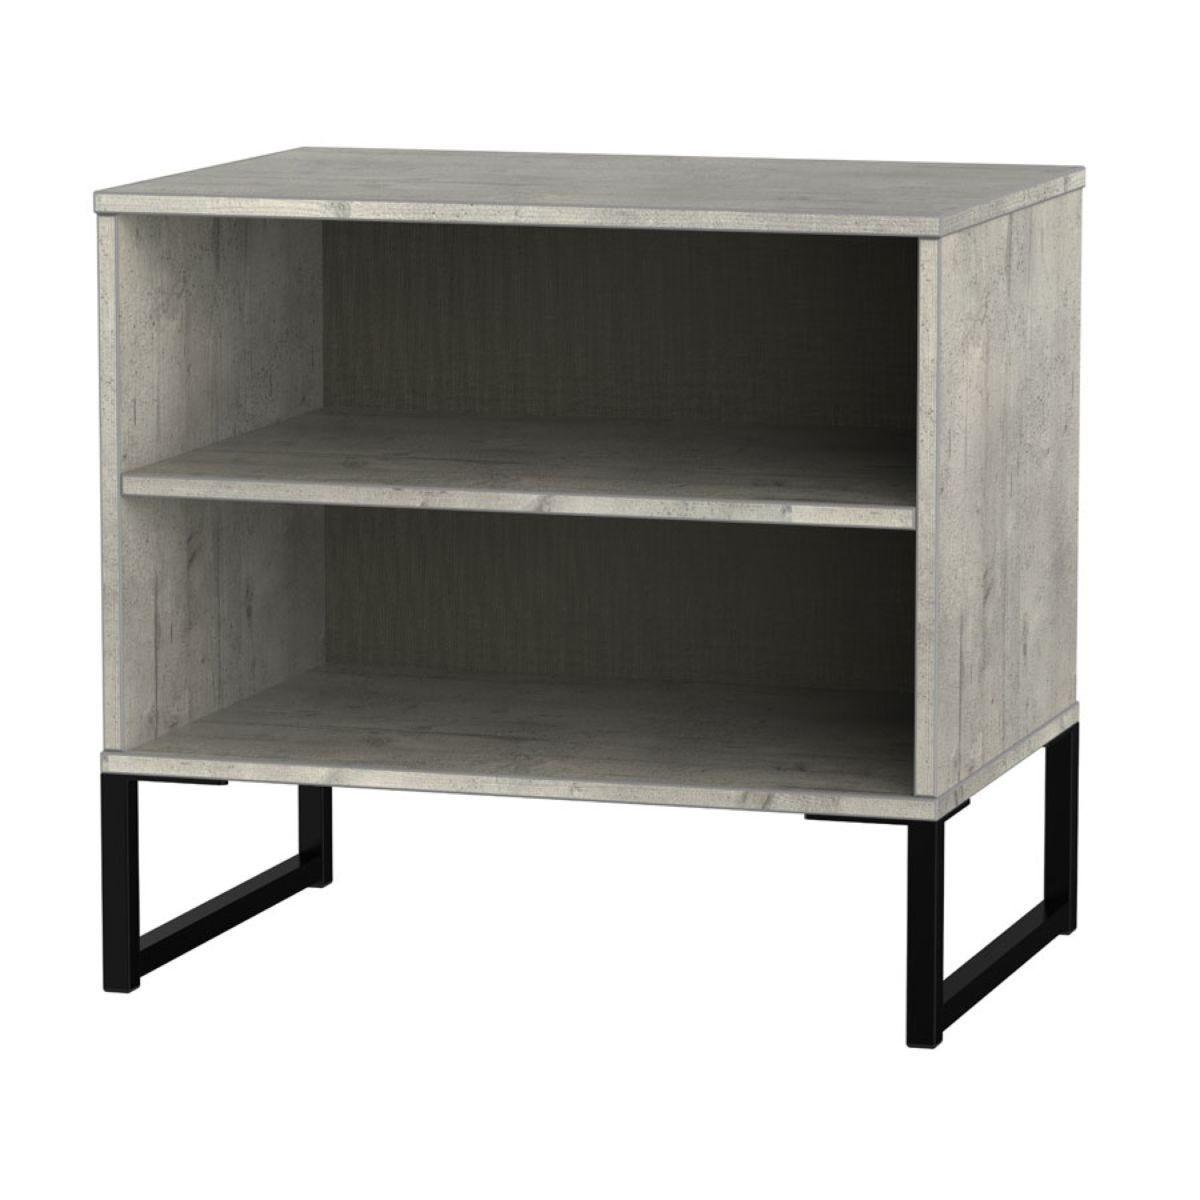 Kishara Open Shelf Double Bedside Cabinet - Stone